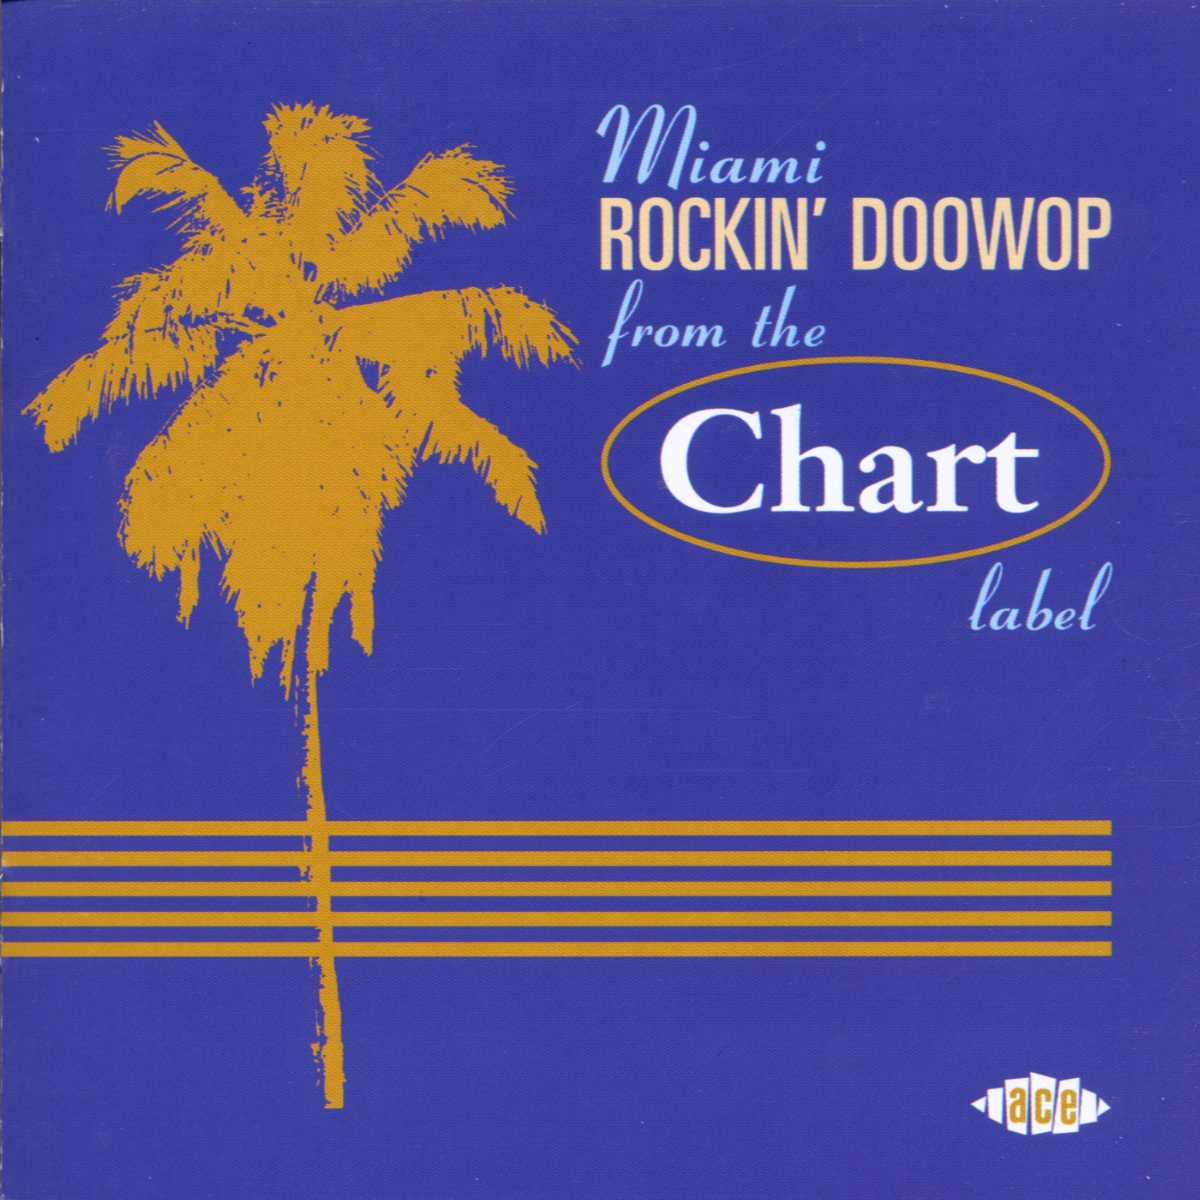 Miami Rockin' Doowop - From The Chart Label - Miami Rockin' Doowop - Musik - Ace - 0029667174824 - 1970